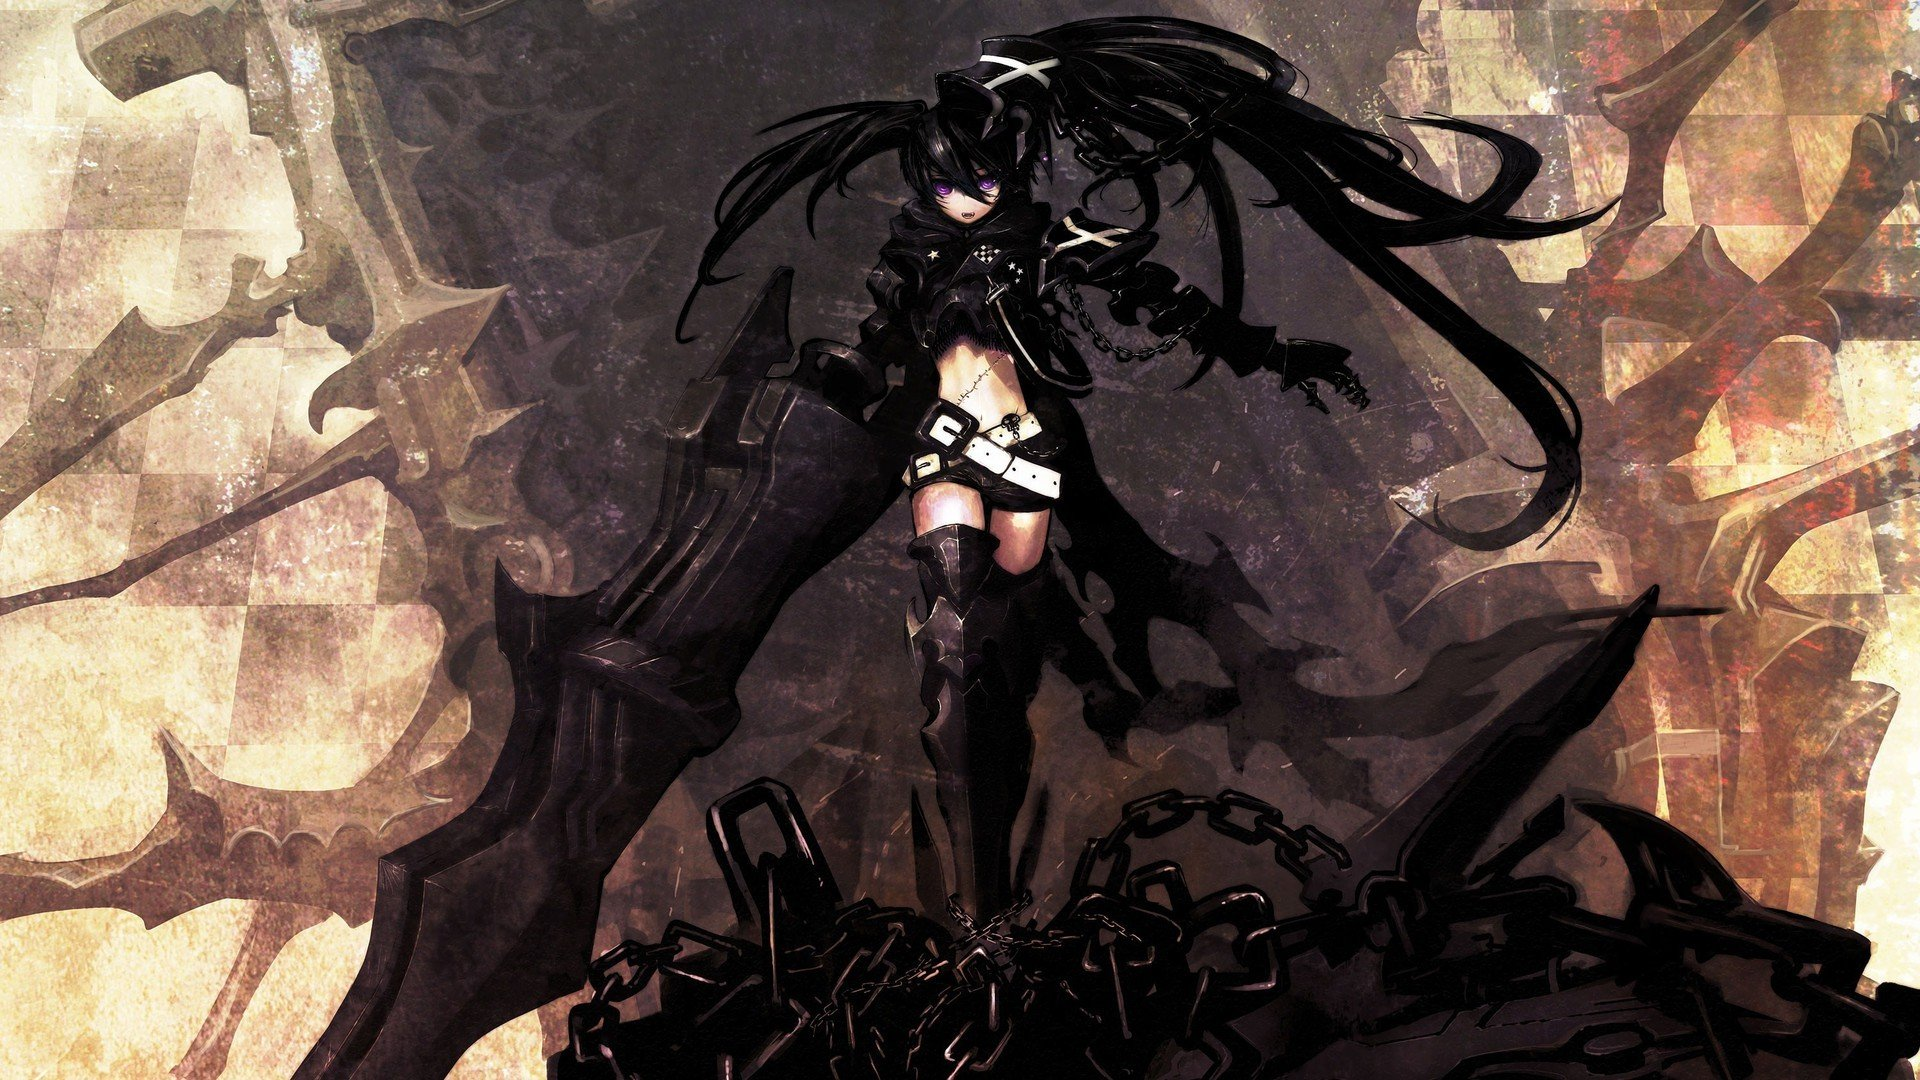 Anime Black Rock Shooter Insane Black Rock Shooter Hd Wallpapers